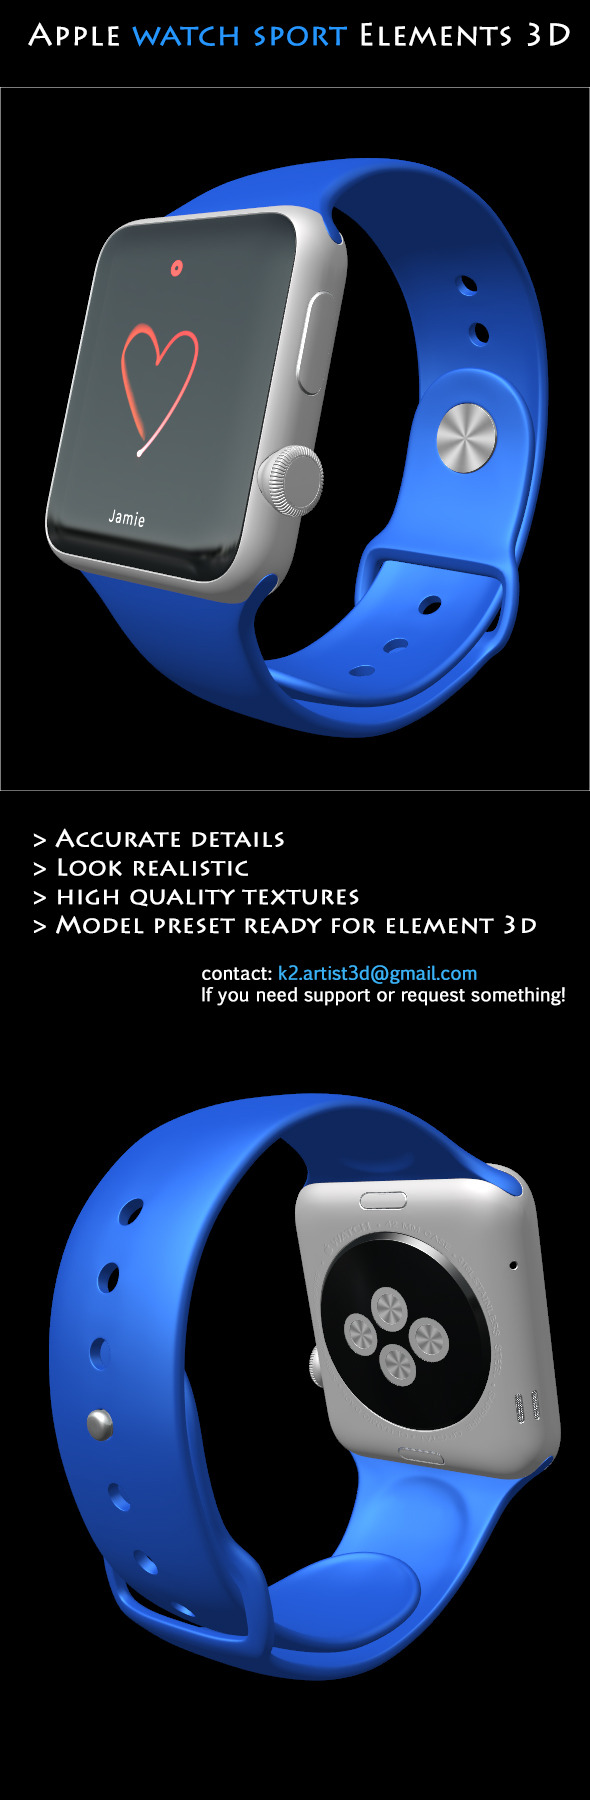 Element3D - Apple Watch Sport - 3DOcean Item for Sale